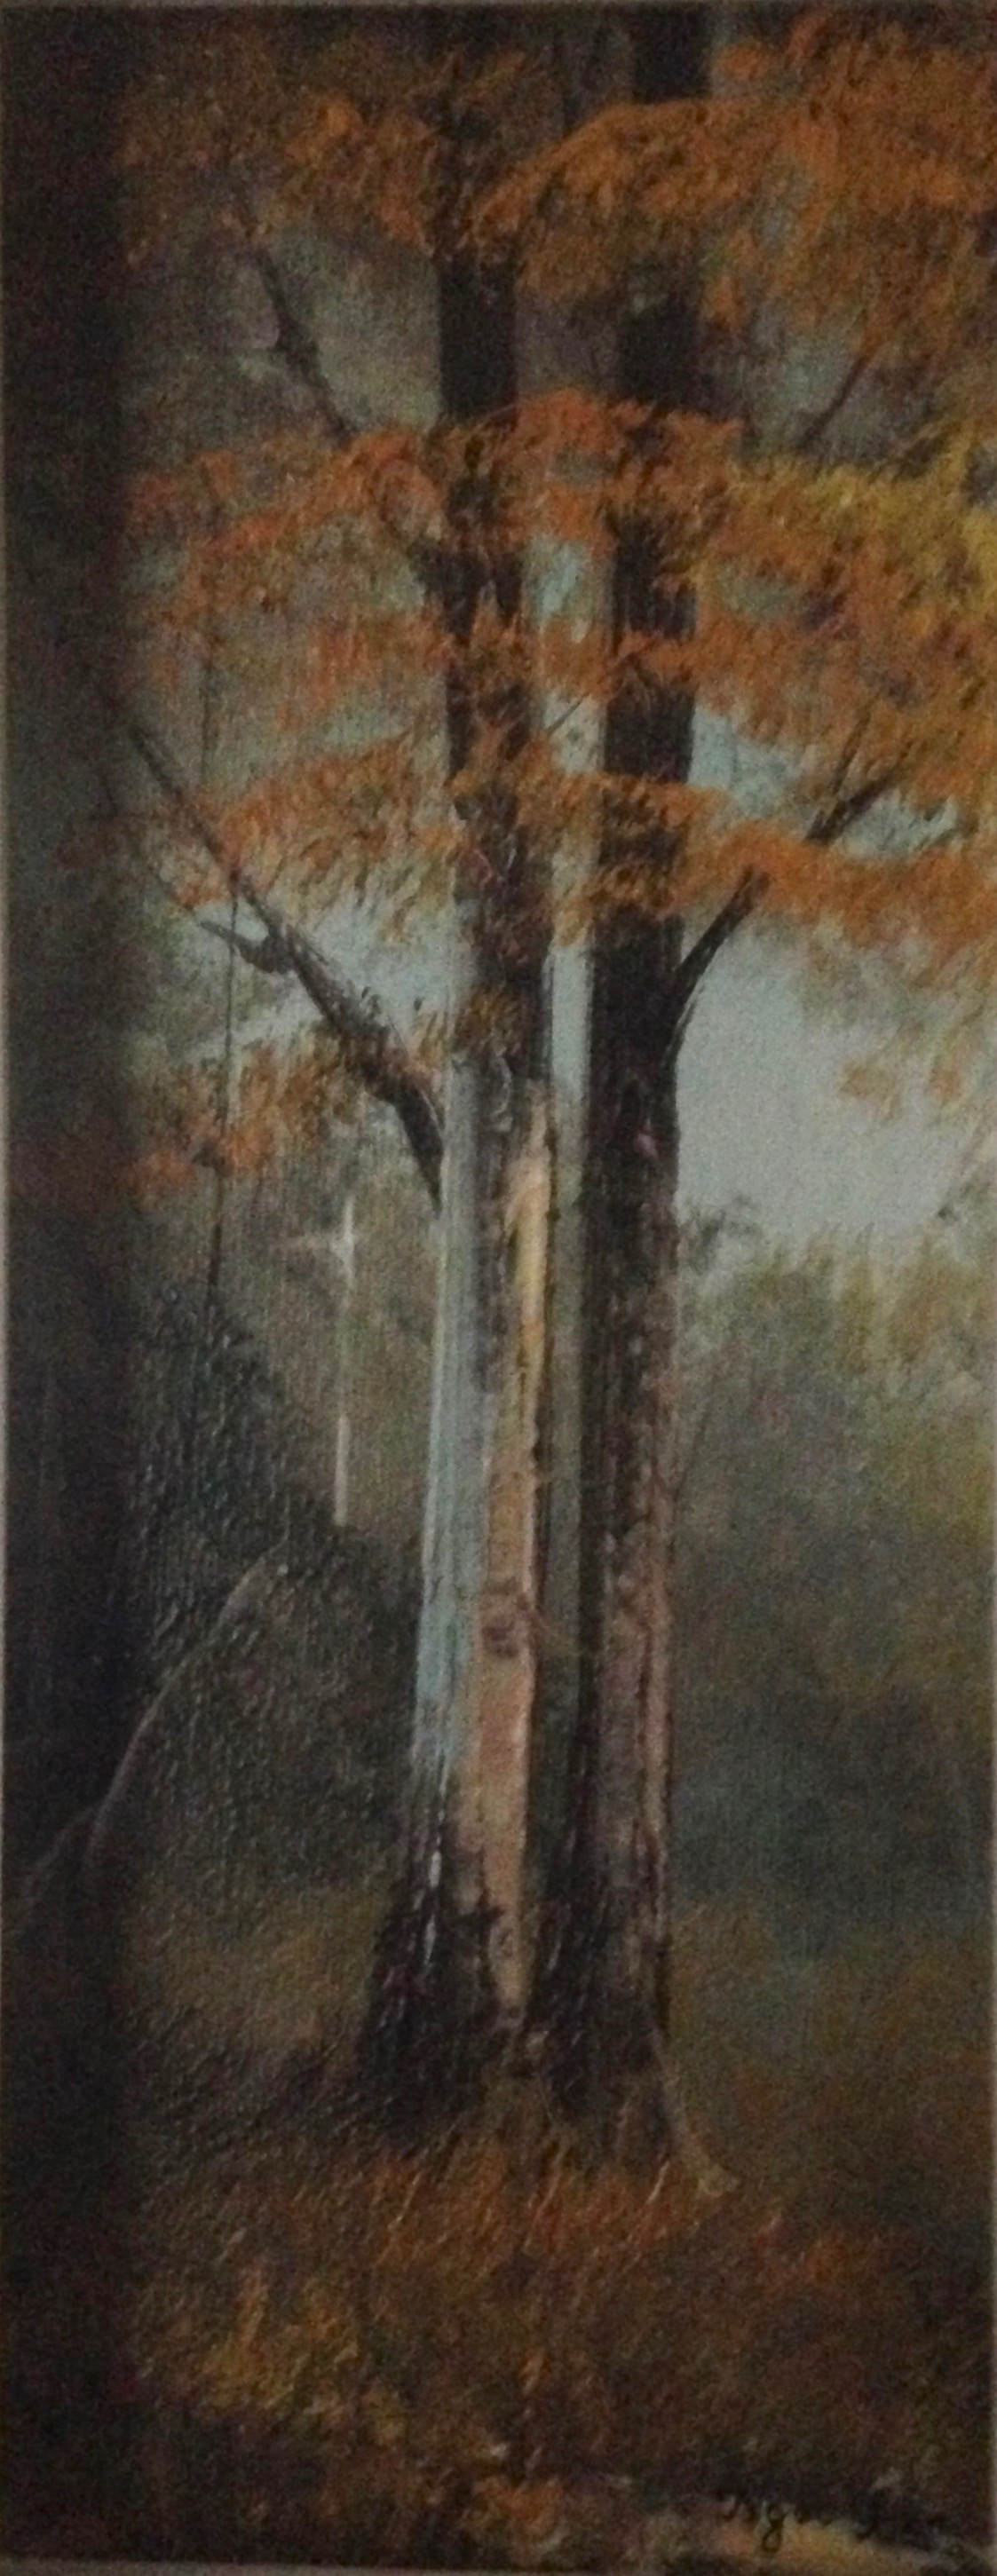 Treescape, Ngoc Tran